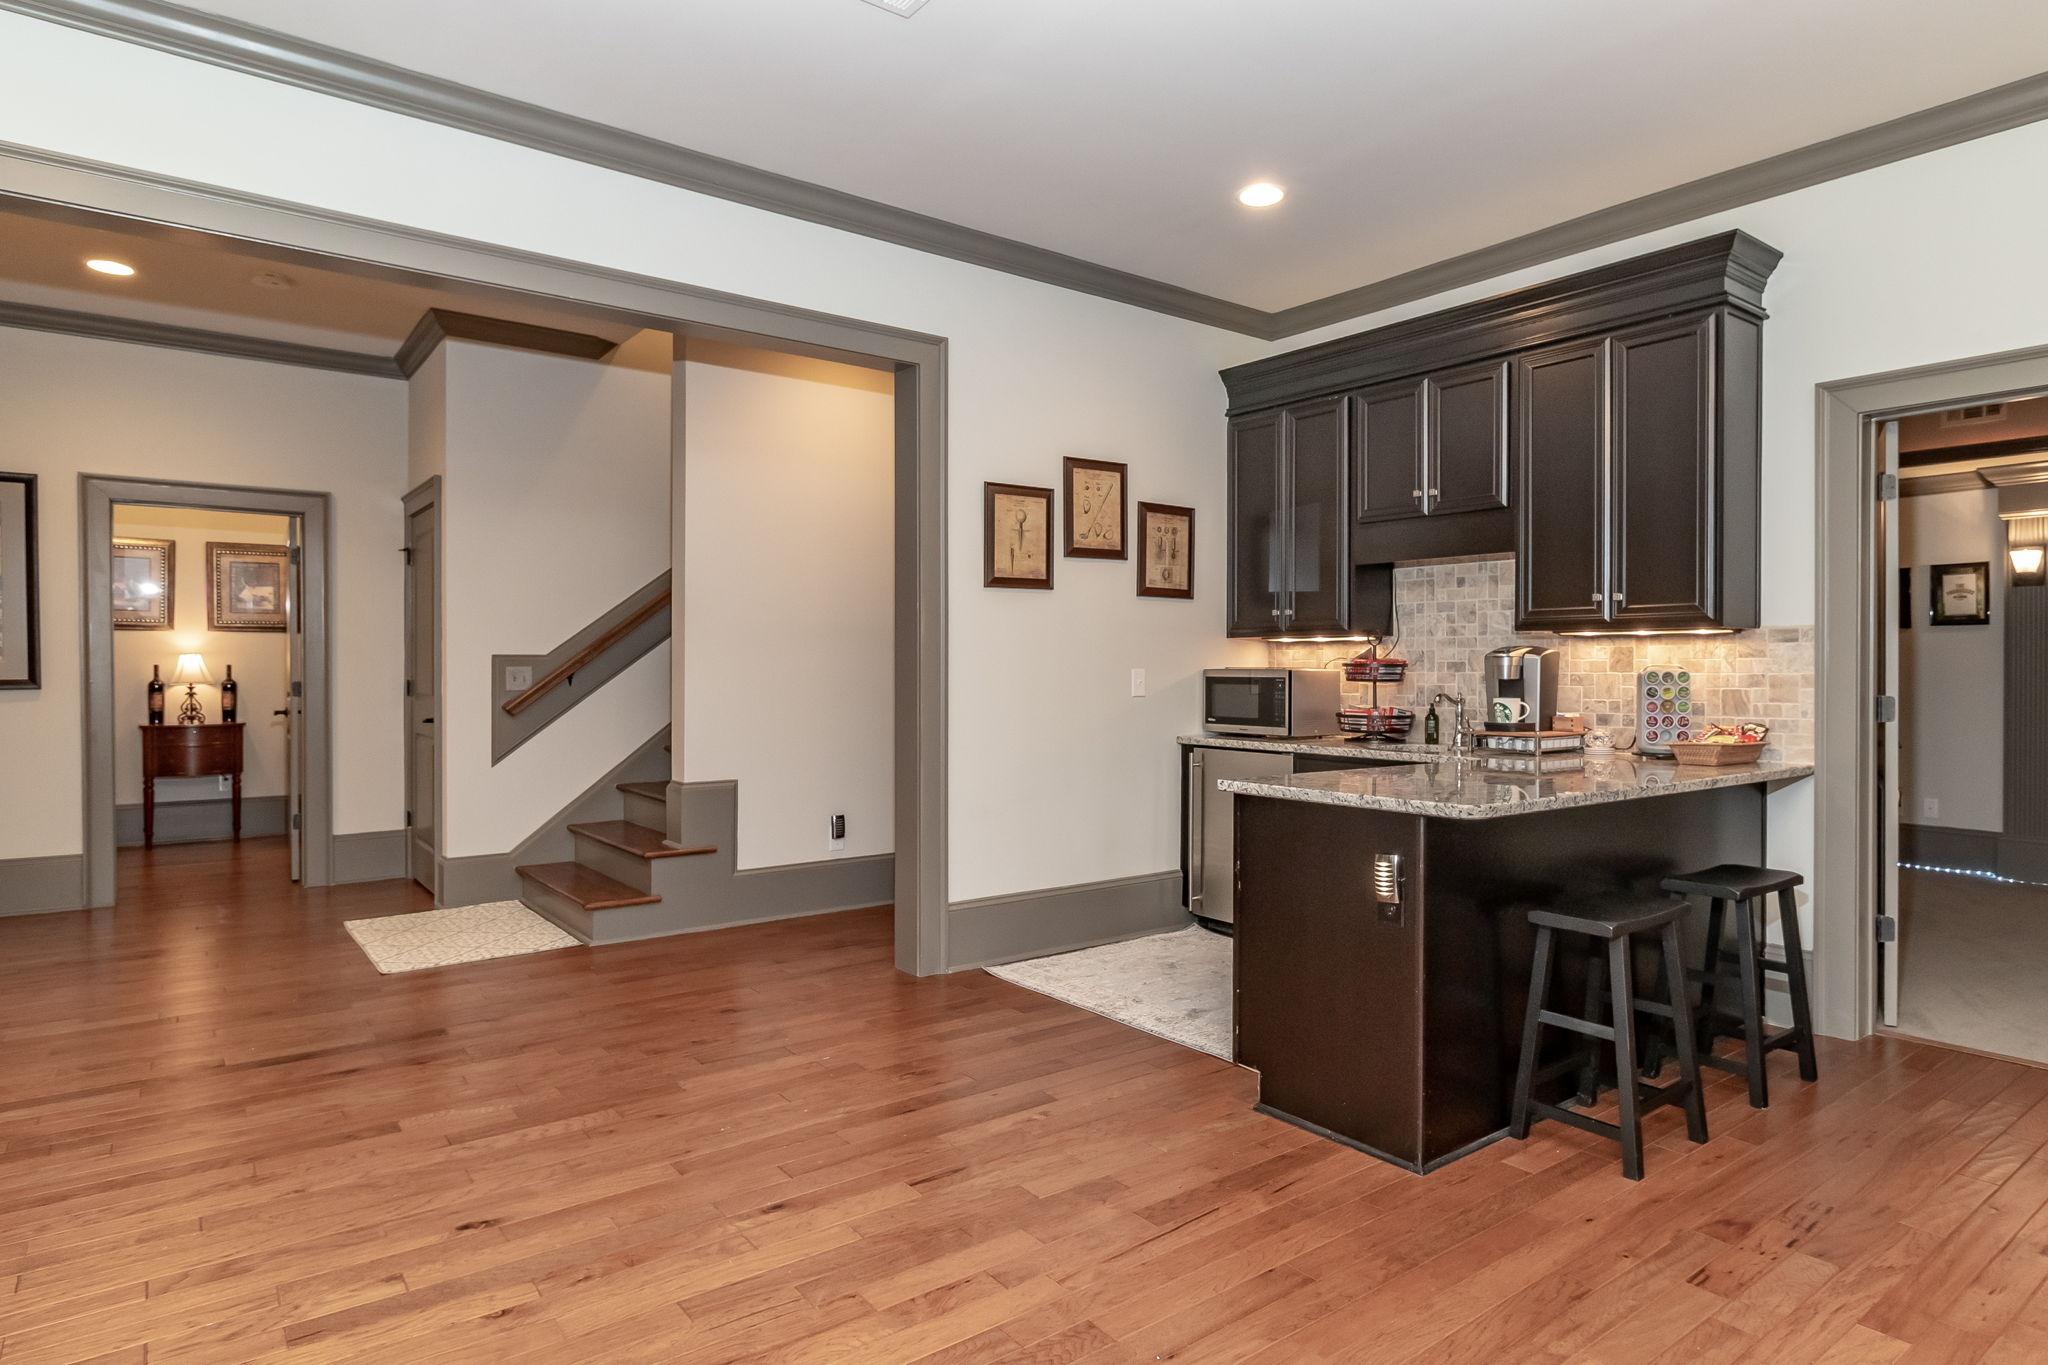 Basement -  Kitchen Area